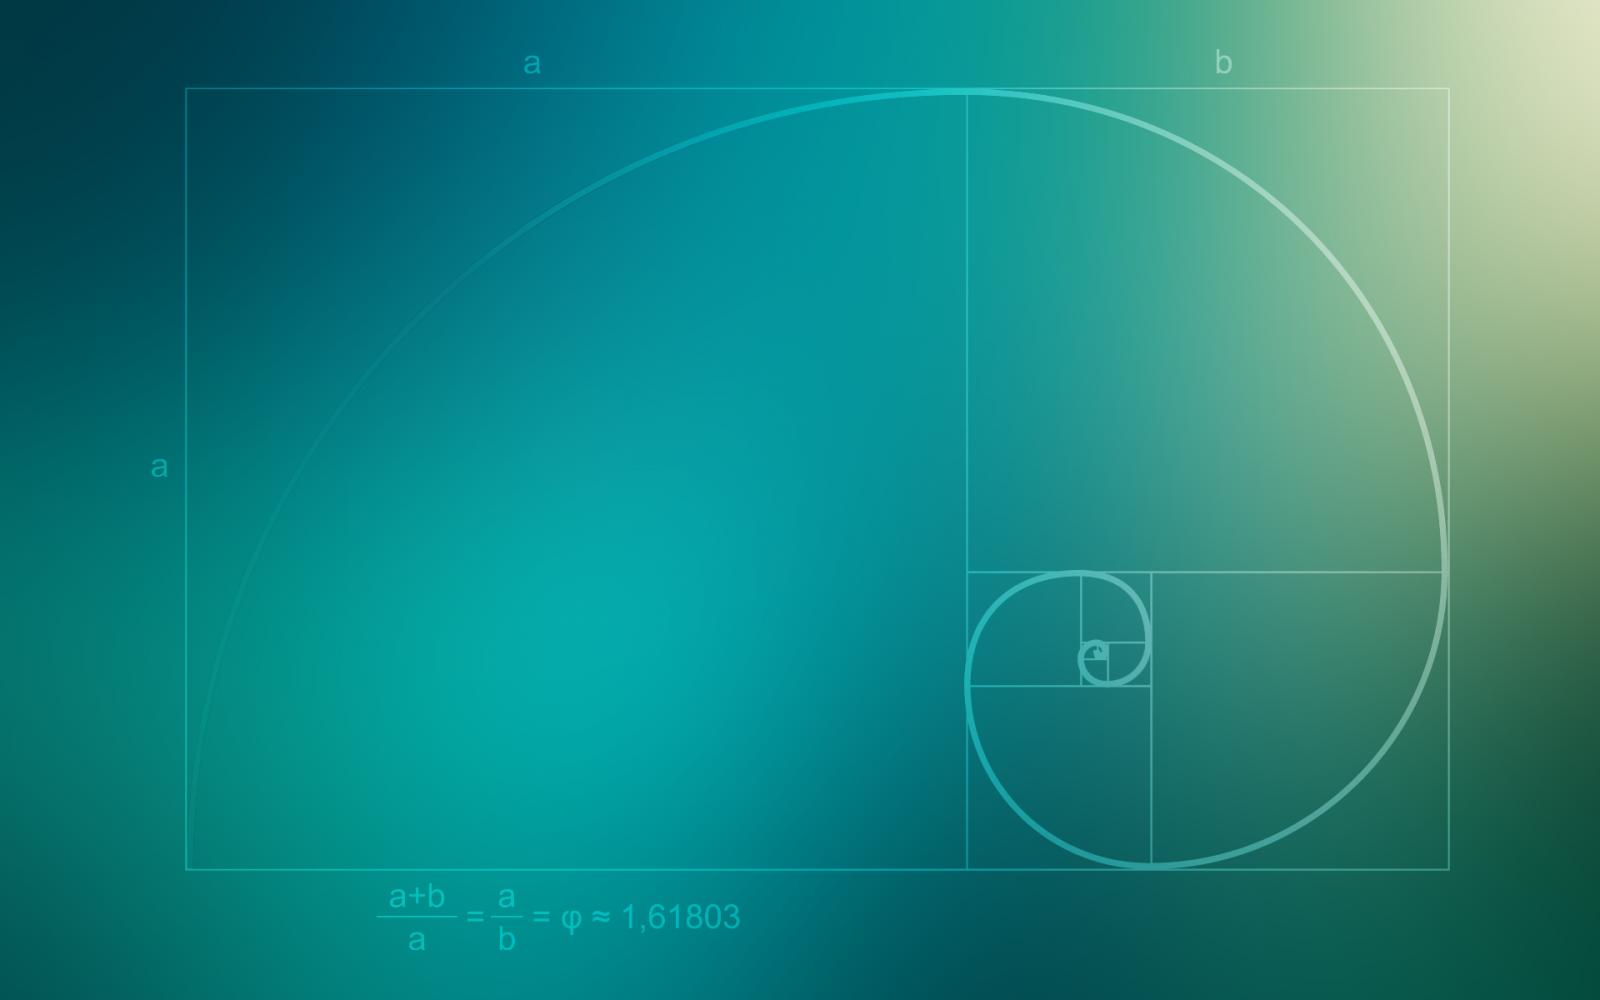 Шерлок днем, картинки для фона презентаций математика